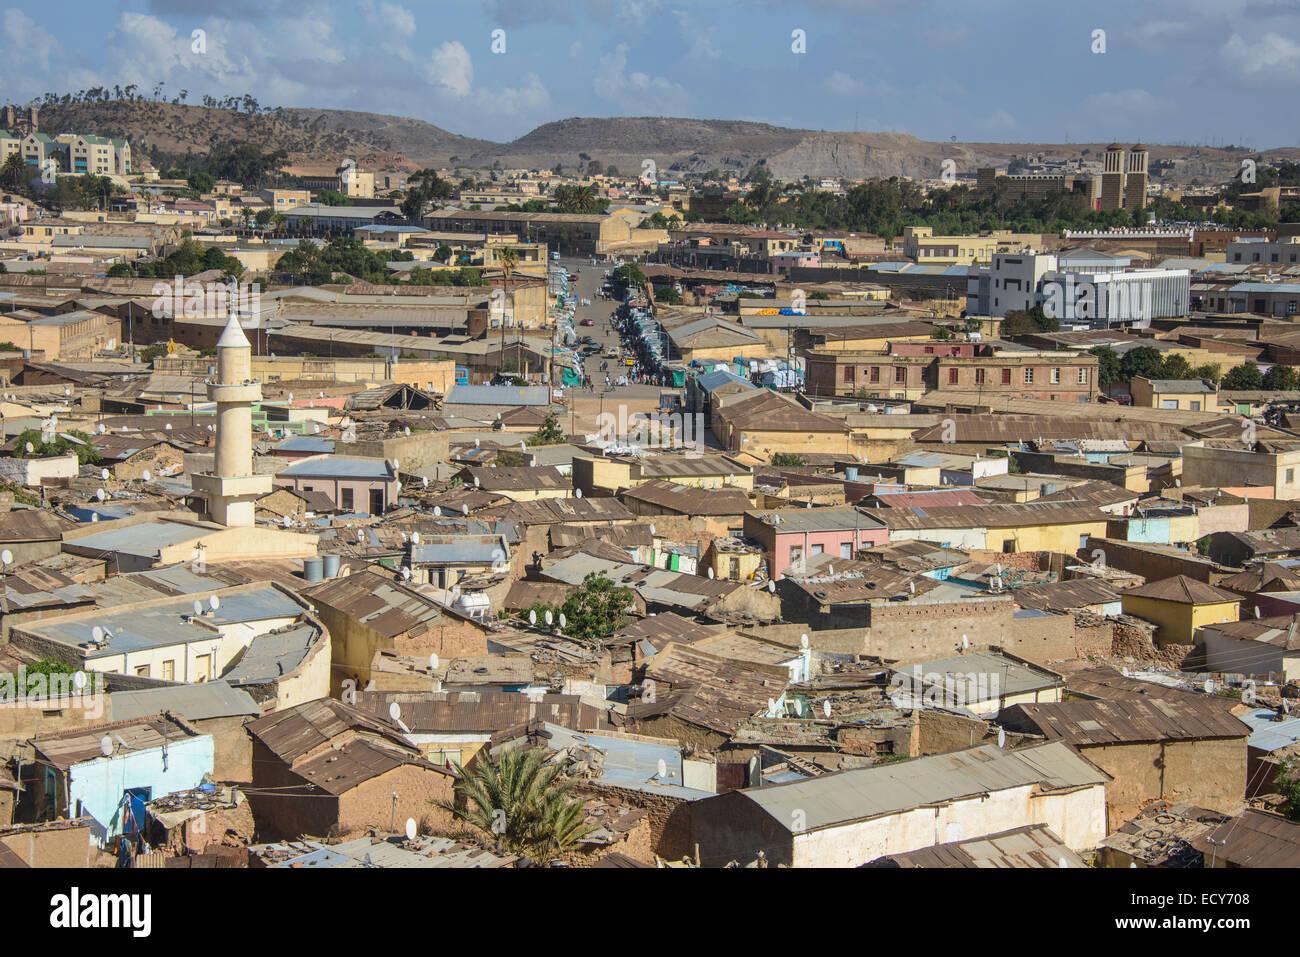 overlooking the city asmara eritrea stock photo 76815544 alamy